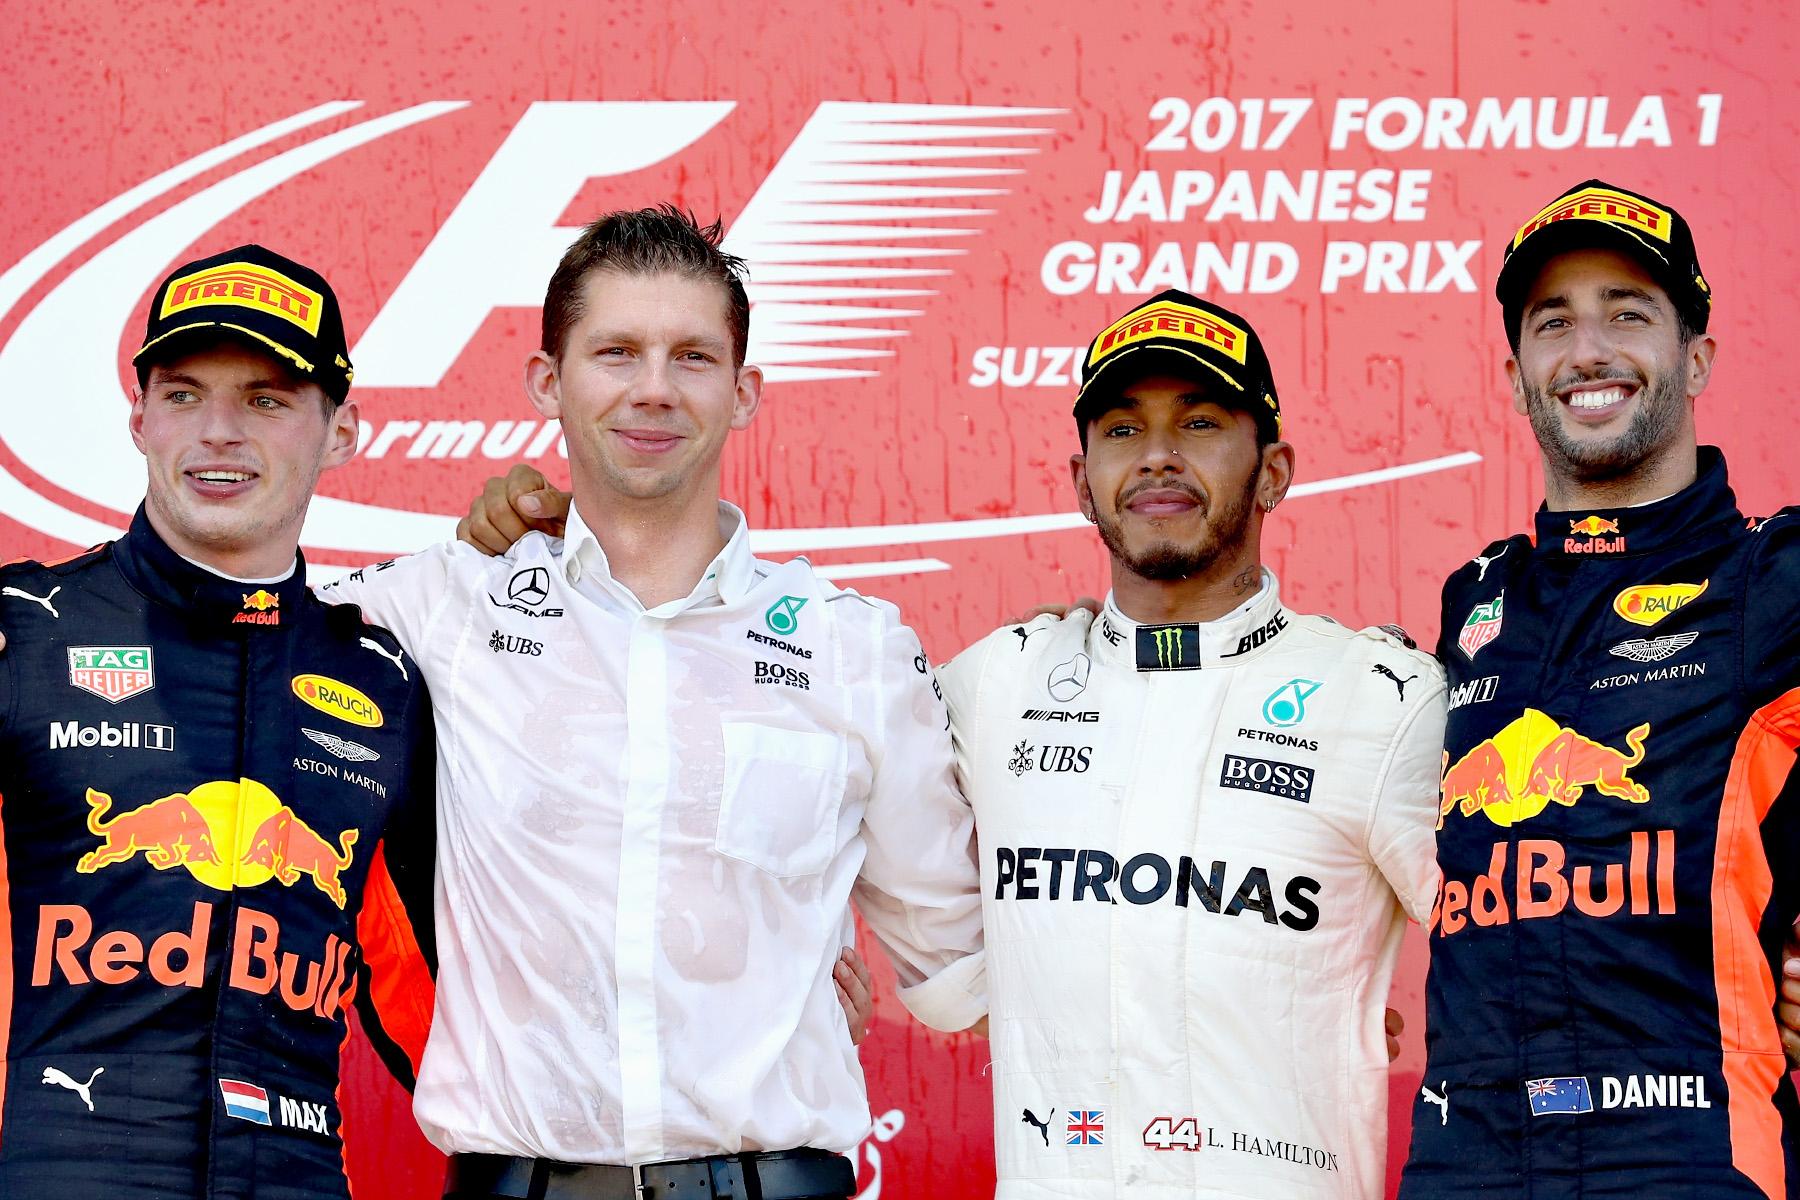 Max Verstappen, Lewis Hamilton and Daniel Ricciardo celebrate on the podium with Mercedes strategist James Vowels on the podium of the 2017 Japanese Grand Prix.